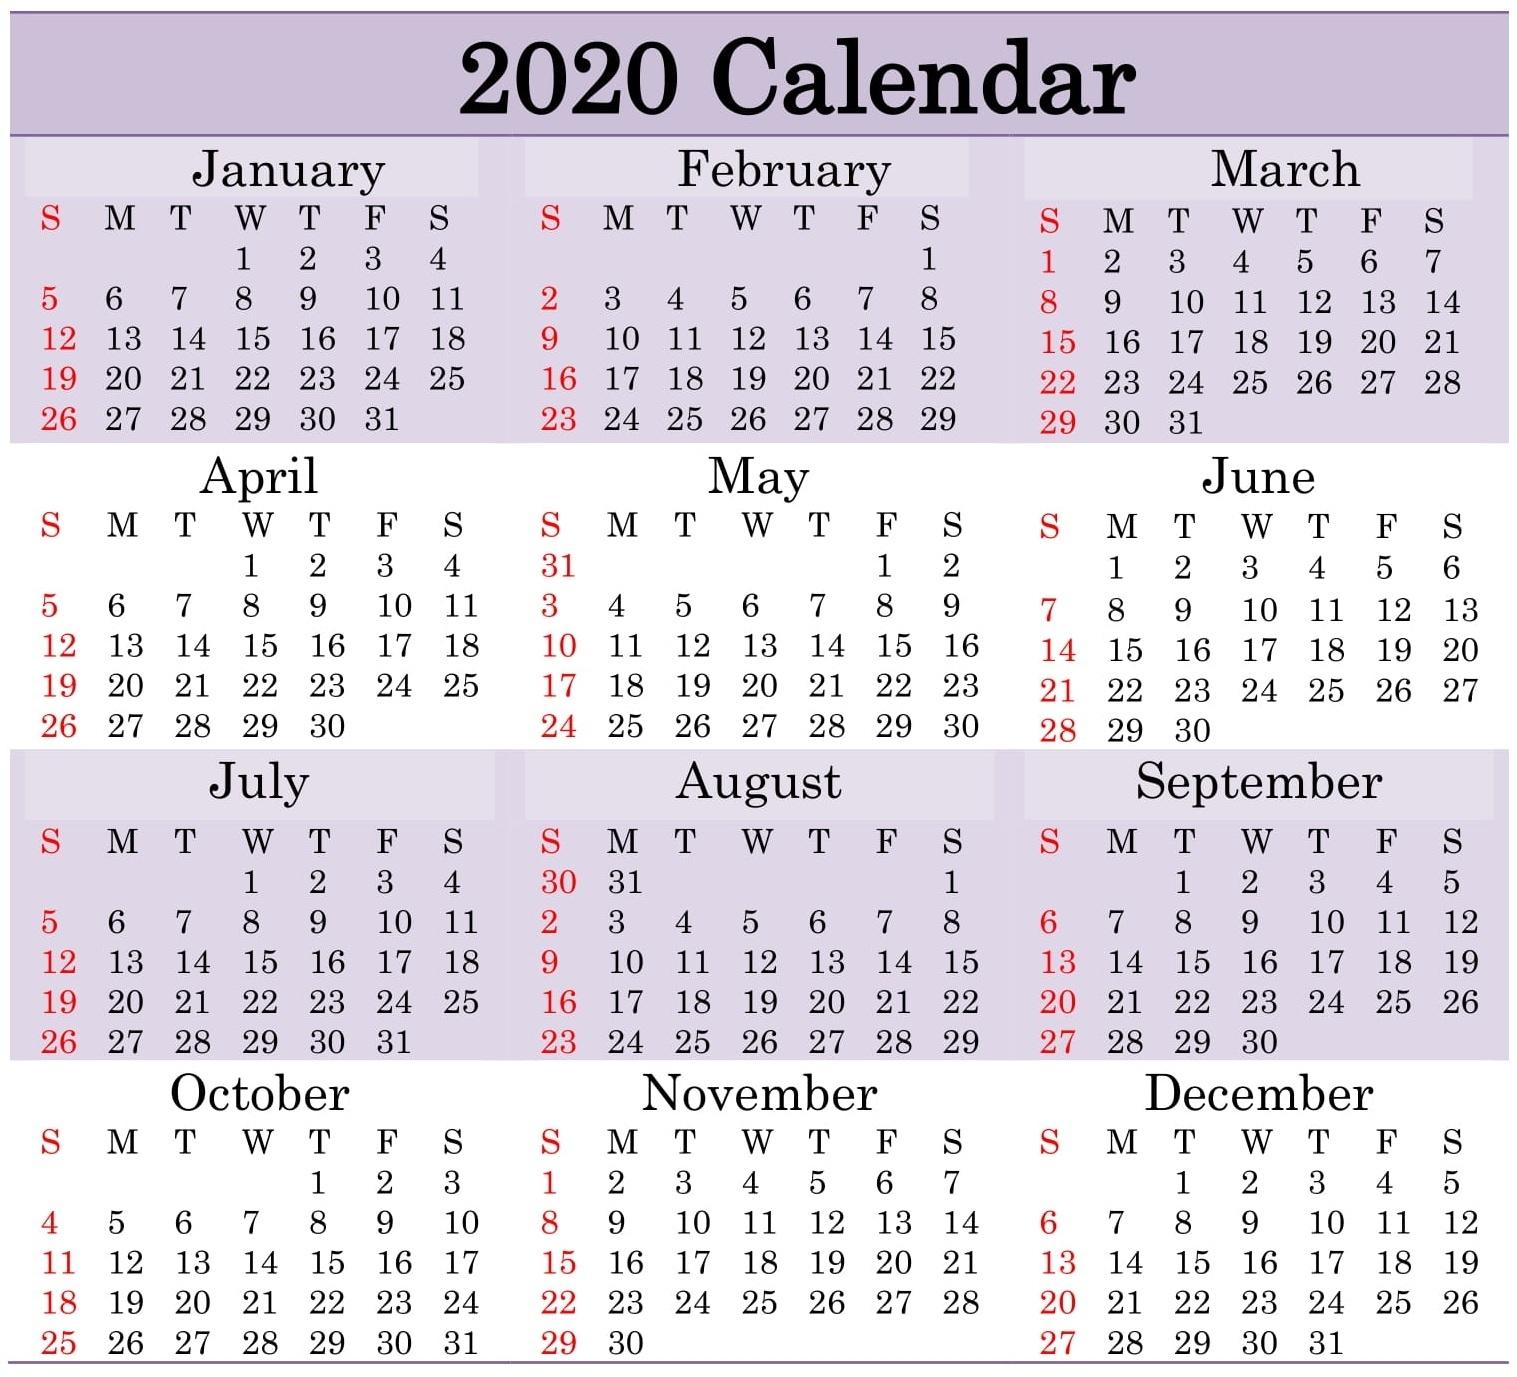 Julian Date Leap Year 2021 | Printable Calendar Template 2020 Throughout Printable Julian Date Calendar Leap Year